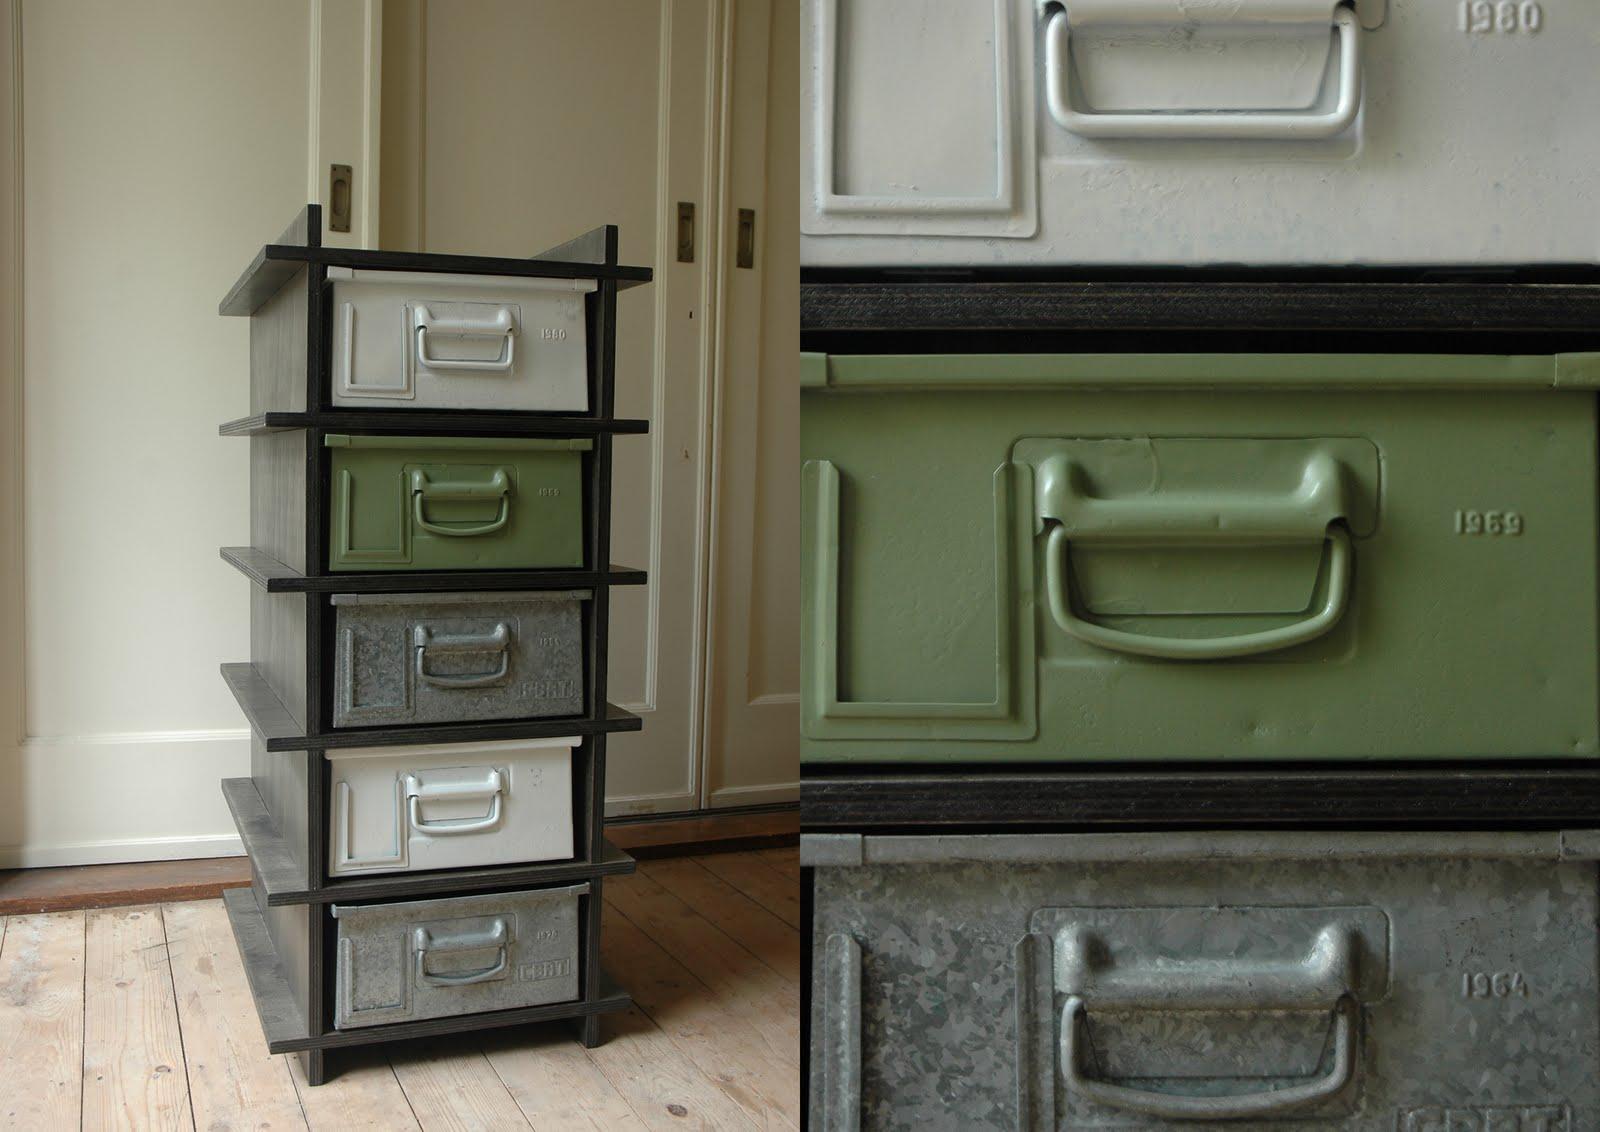 ... style blog  casa, arredamento, design #getinspired: INDUSTRIAL STYLE